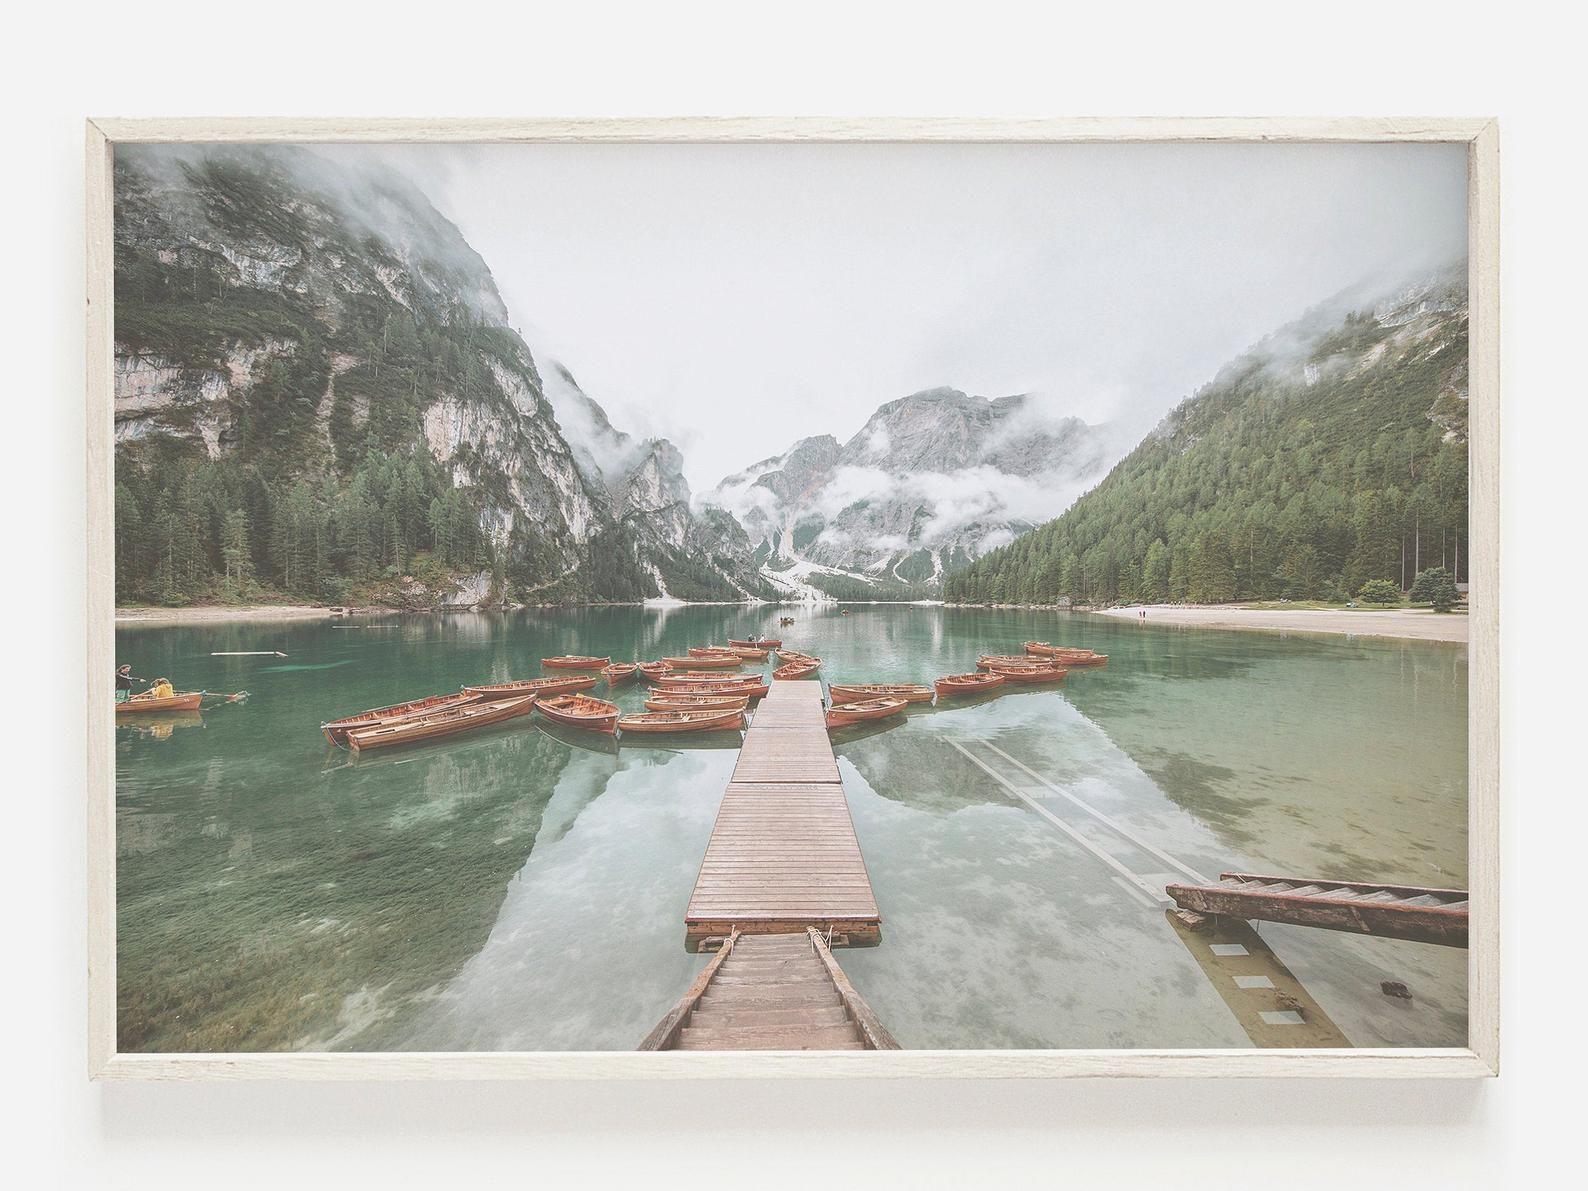 Lake Louise Wall Art Canada Lake Print Banff Park Boats On Etsy In 2020 Wall Art Canada Ocean Wall Art Canada Lakes